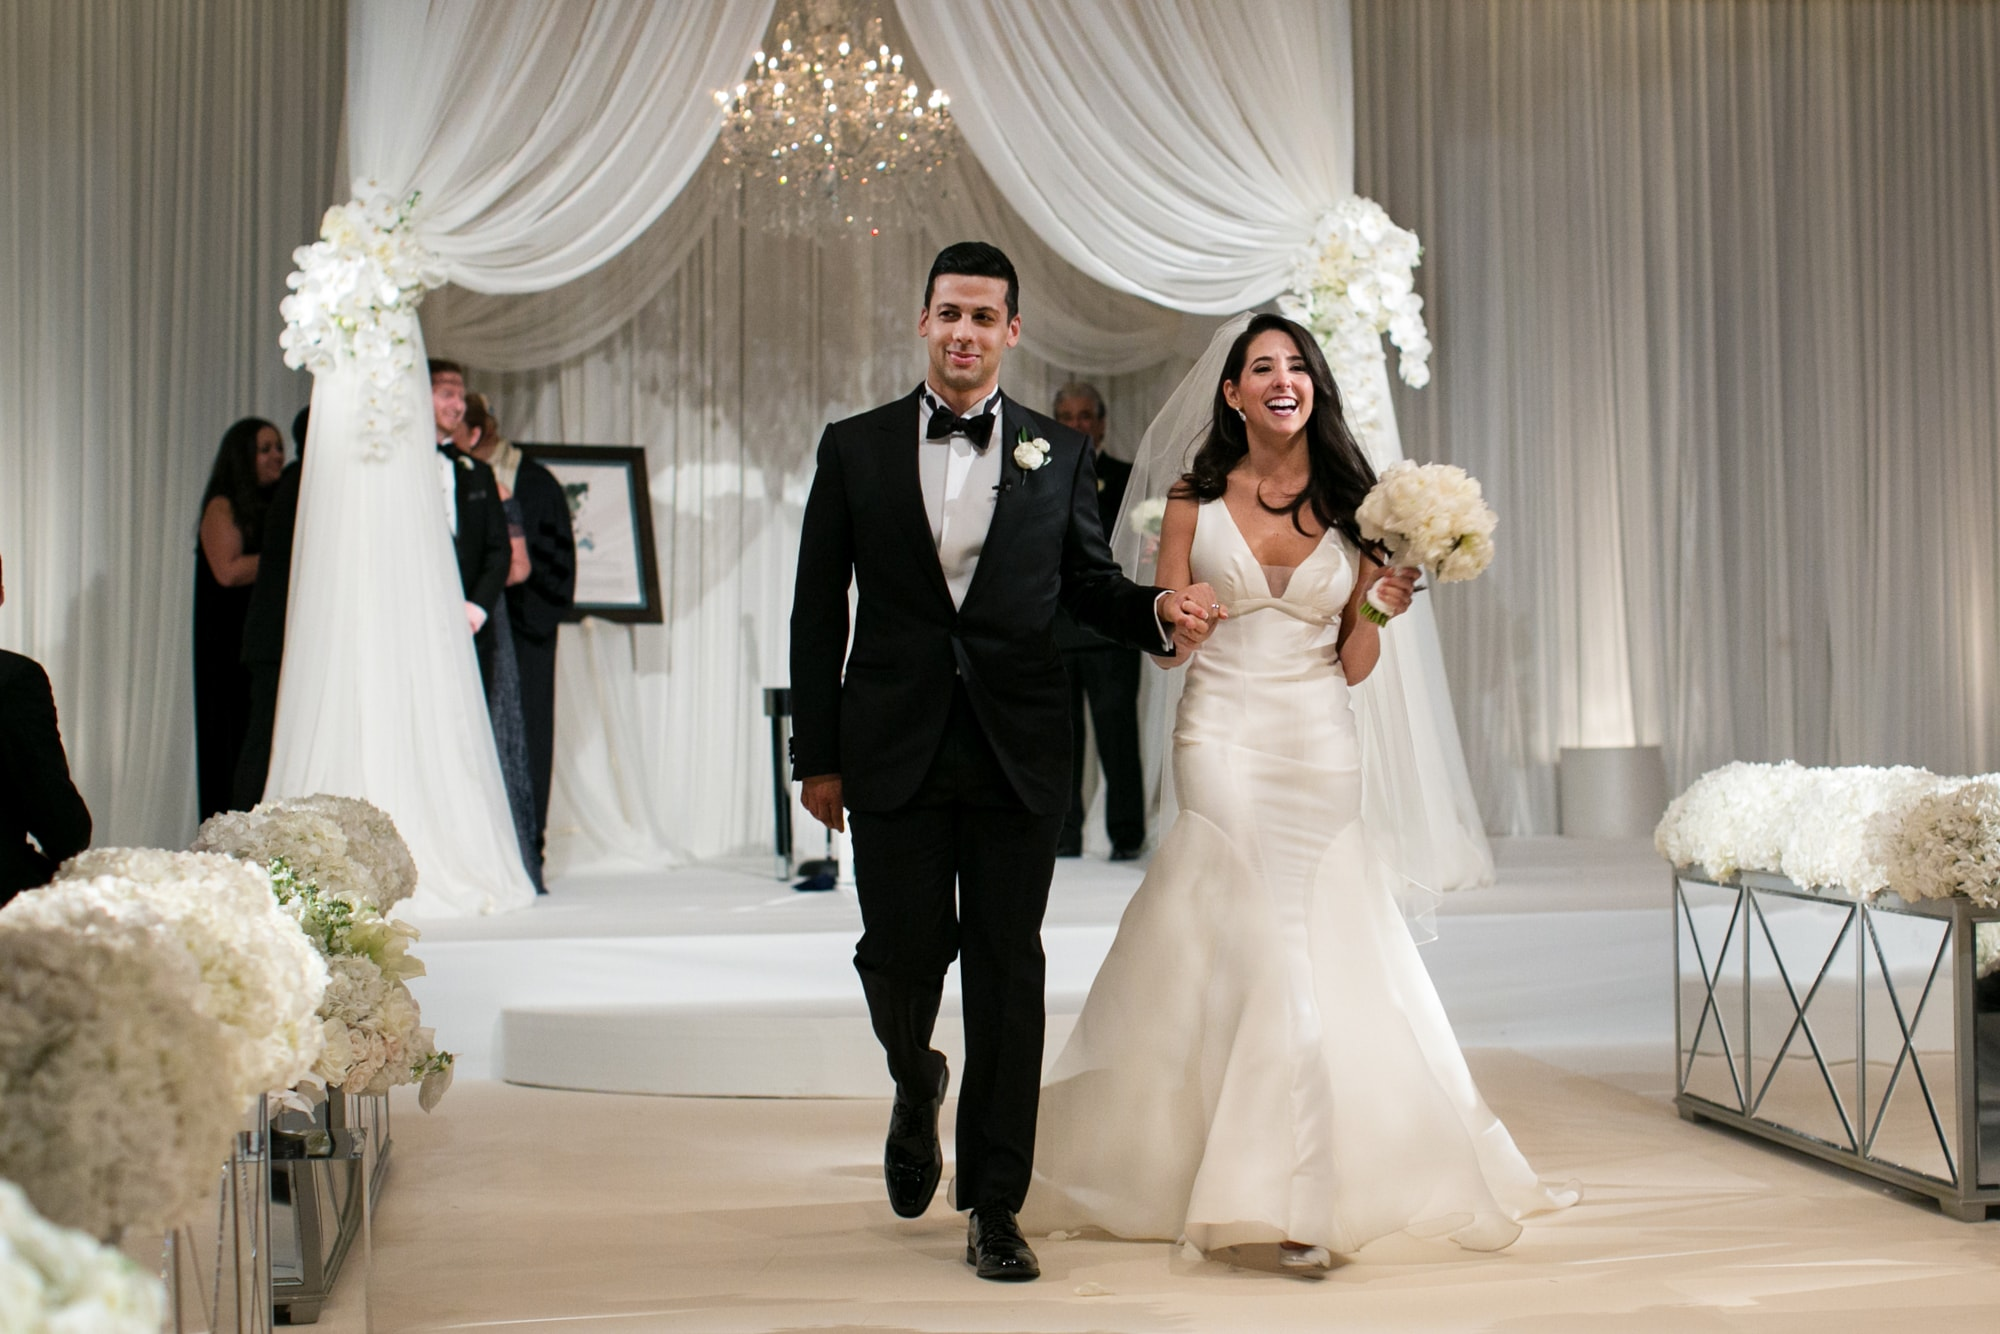 Pretty wedding recessional with white huppa